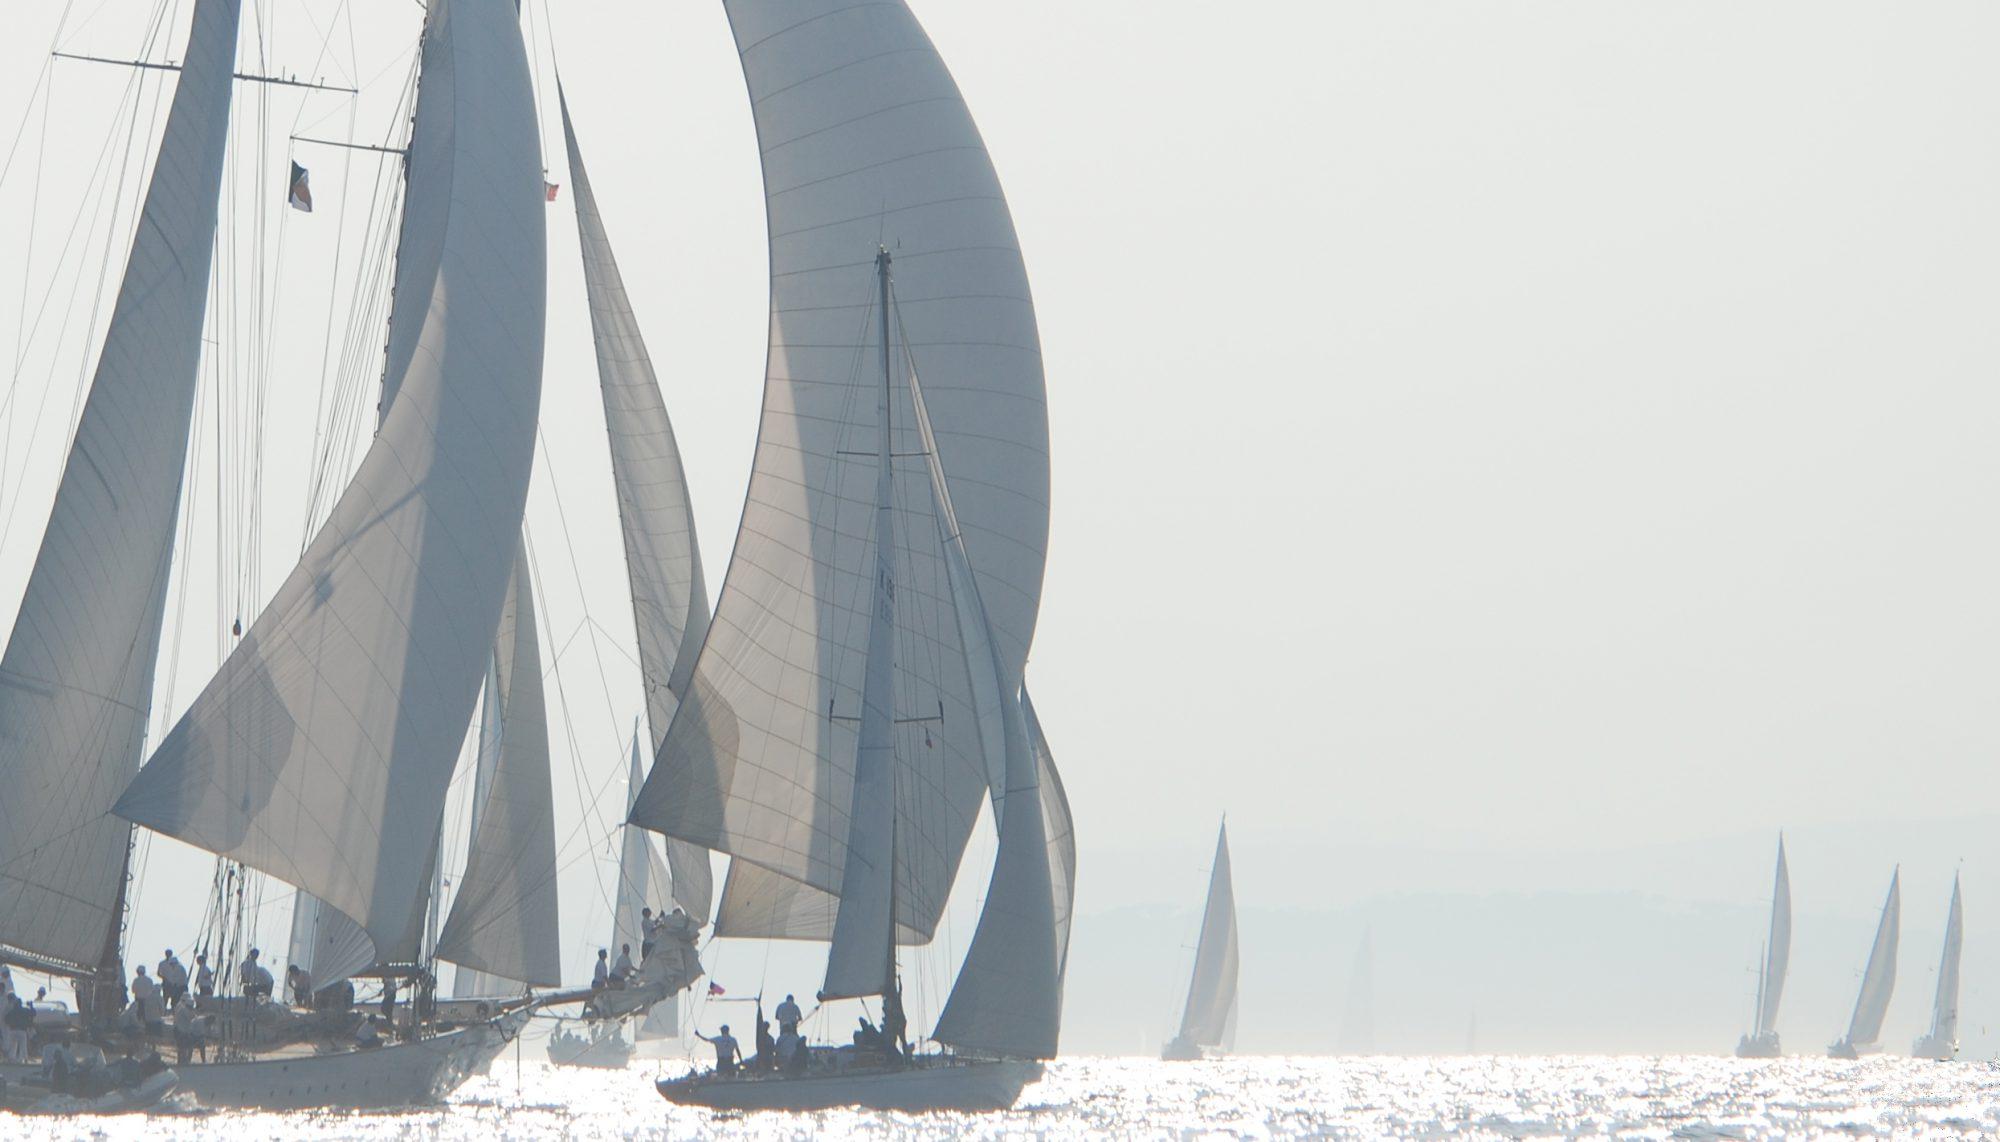 Noordster classic yachting